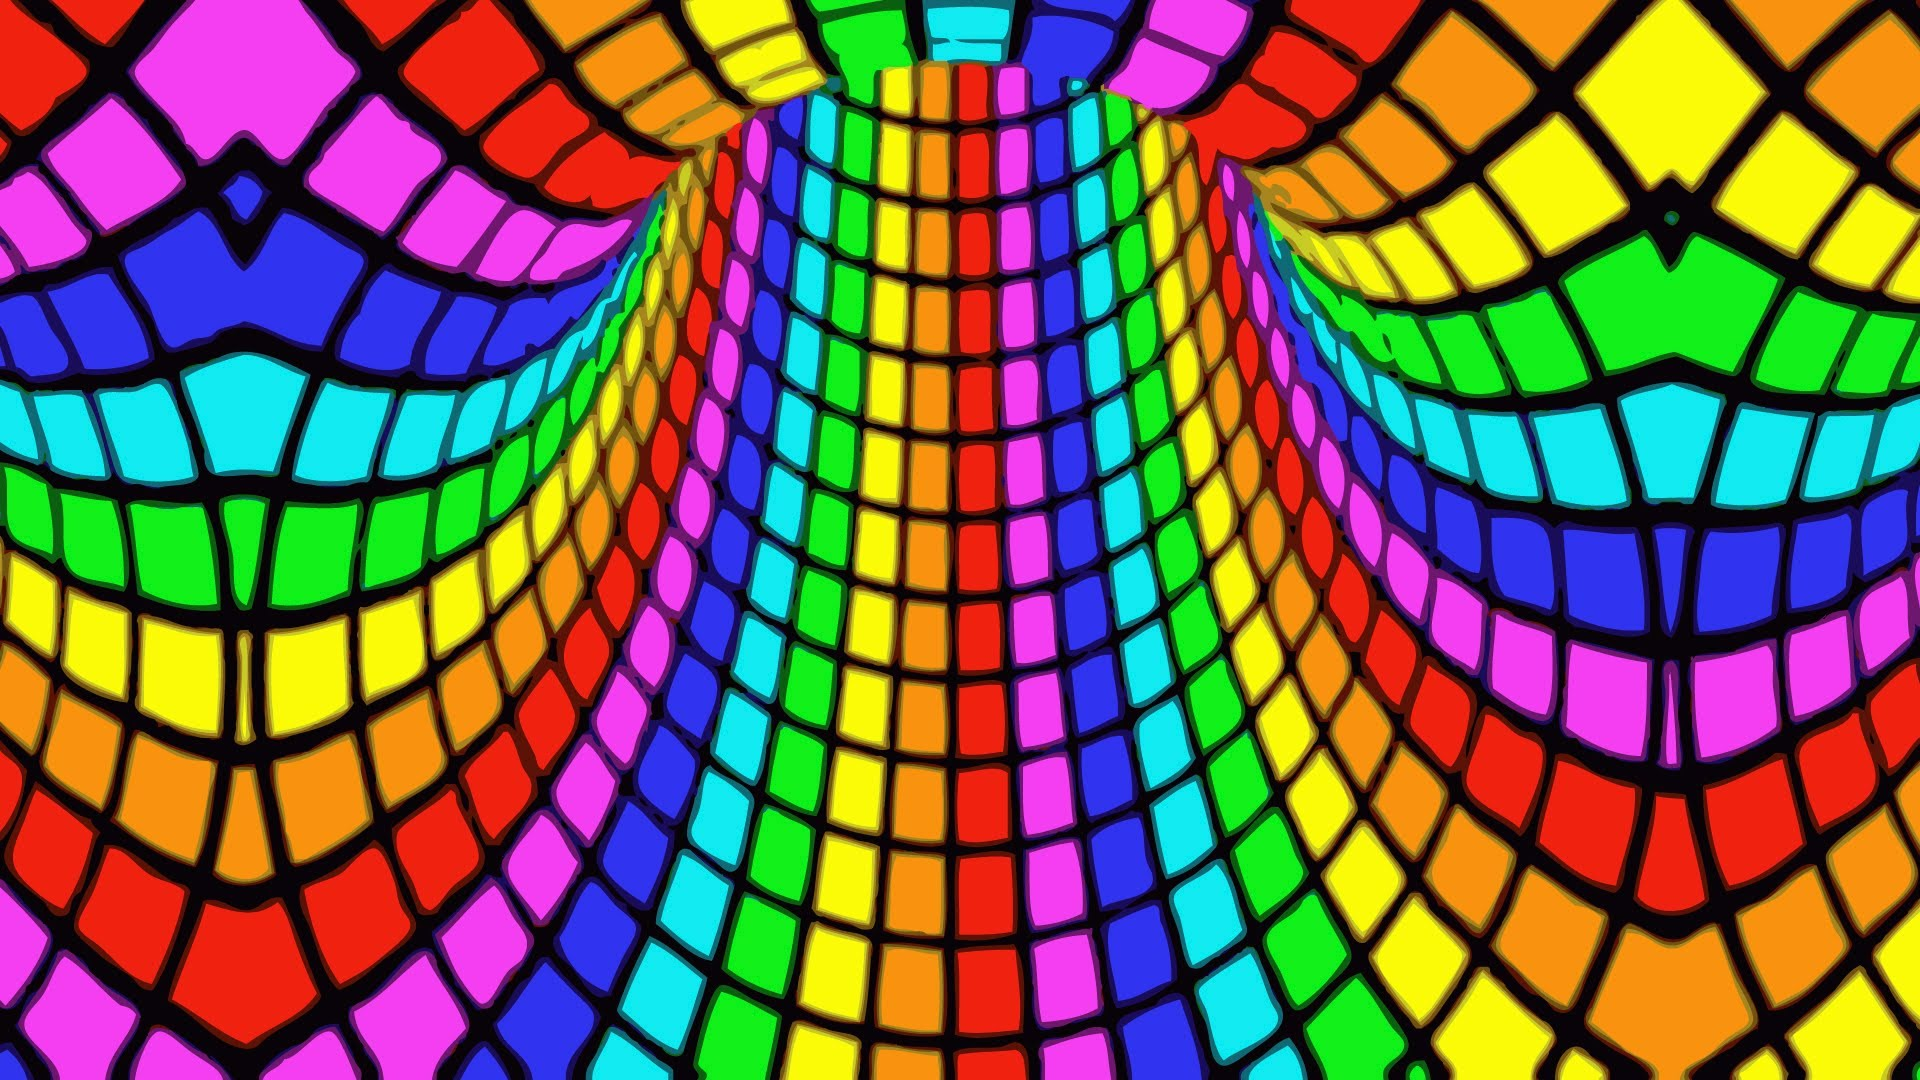 Cool Trippy Wallpaper Download